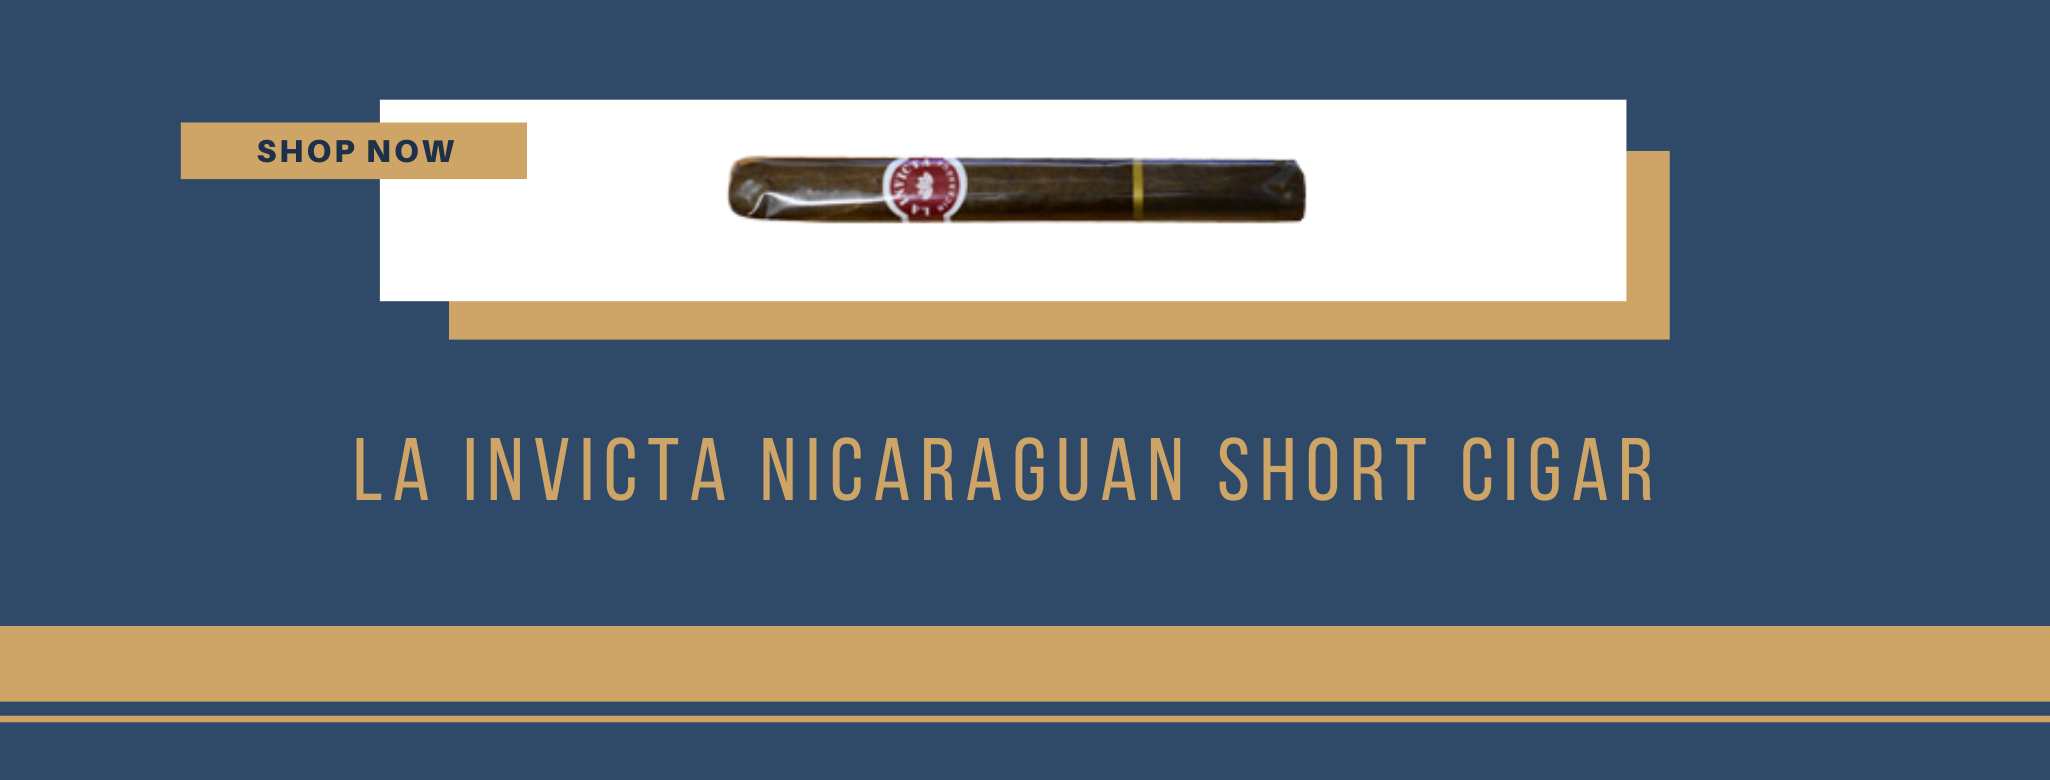 Buy La Invicta Nicaraguan Short cigars online